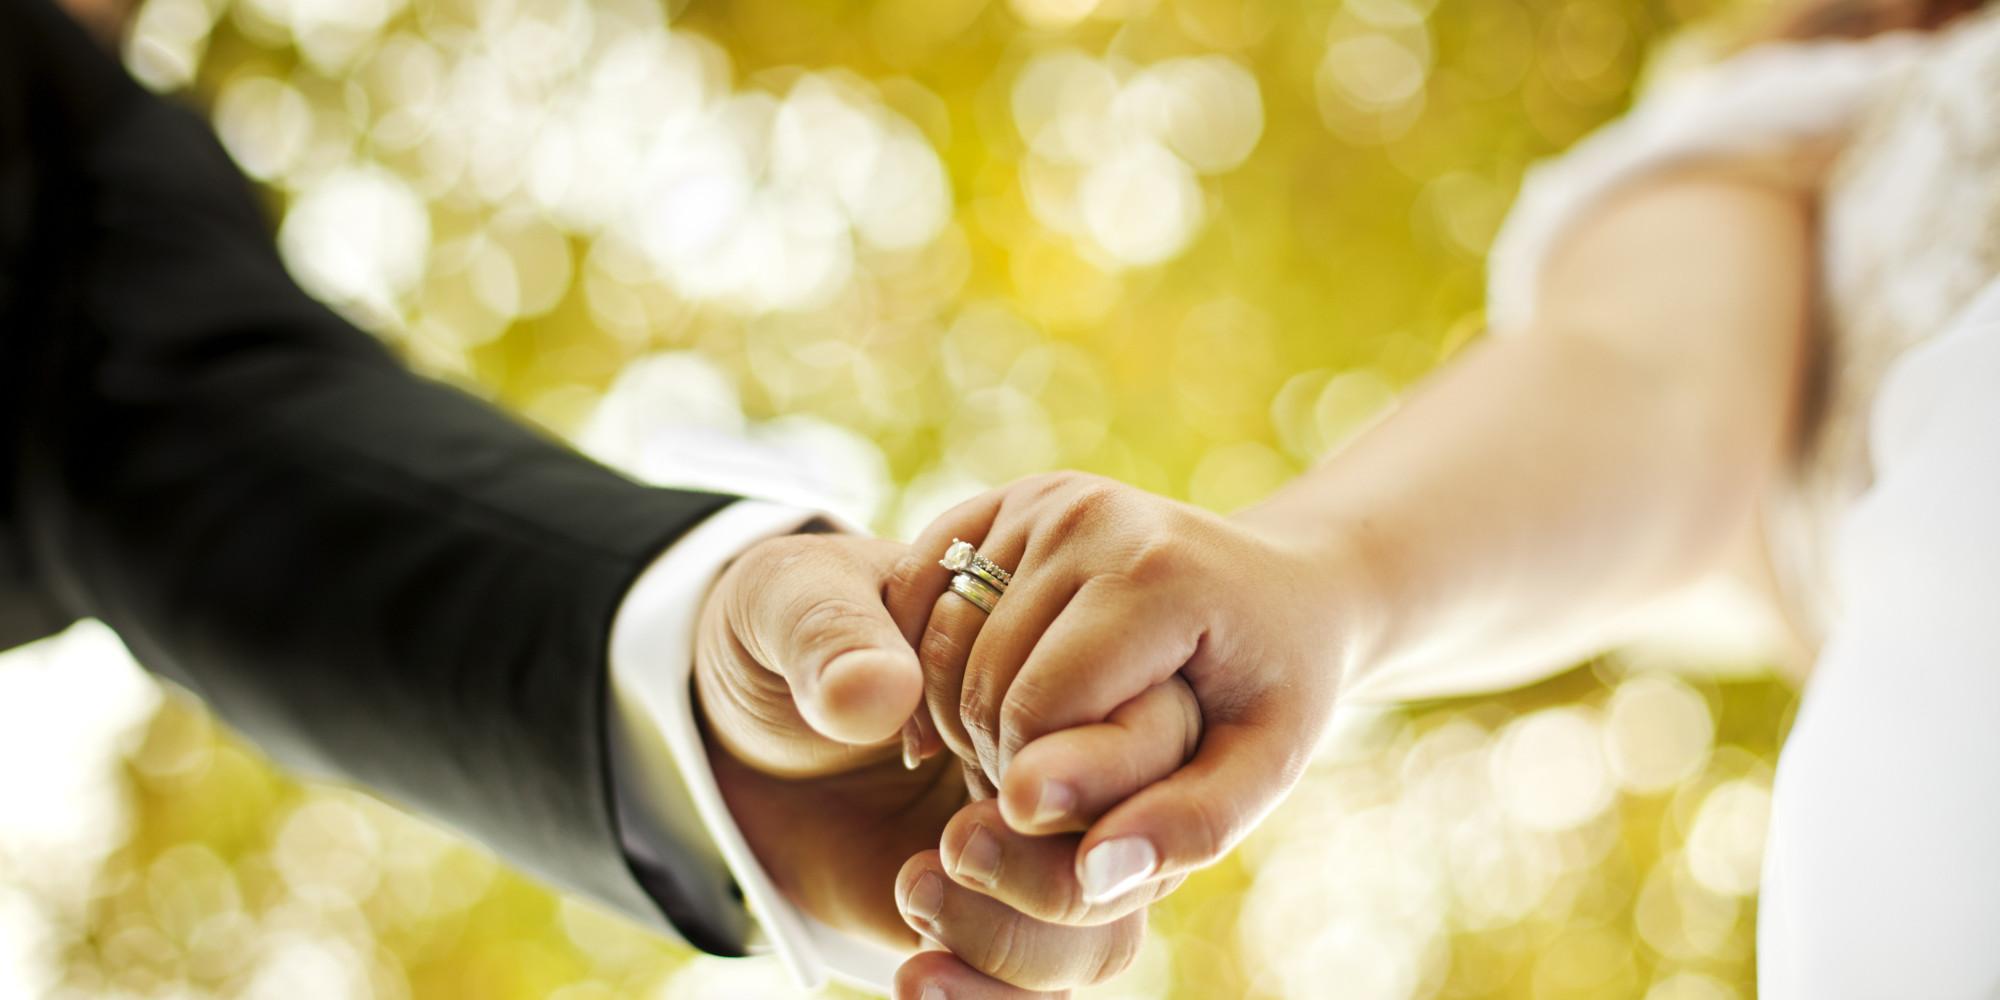 hands - Свадебные фото